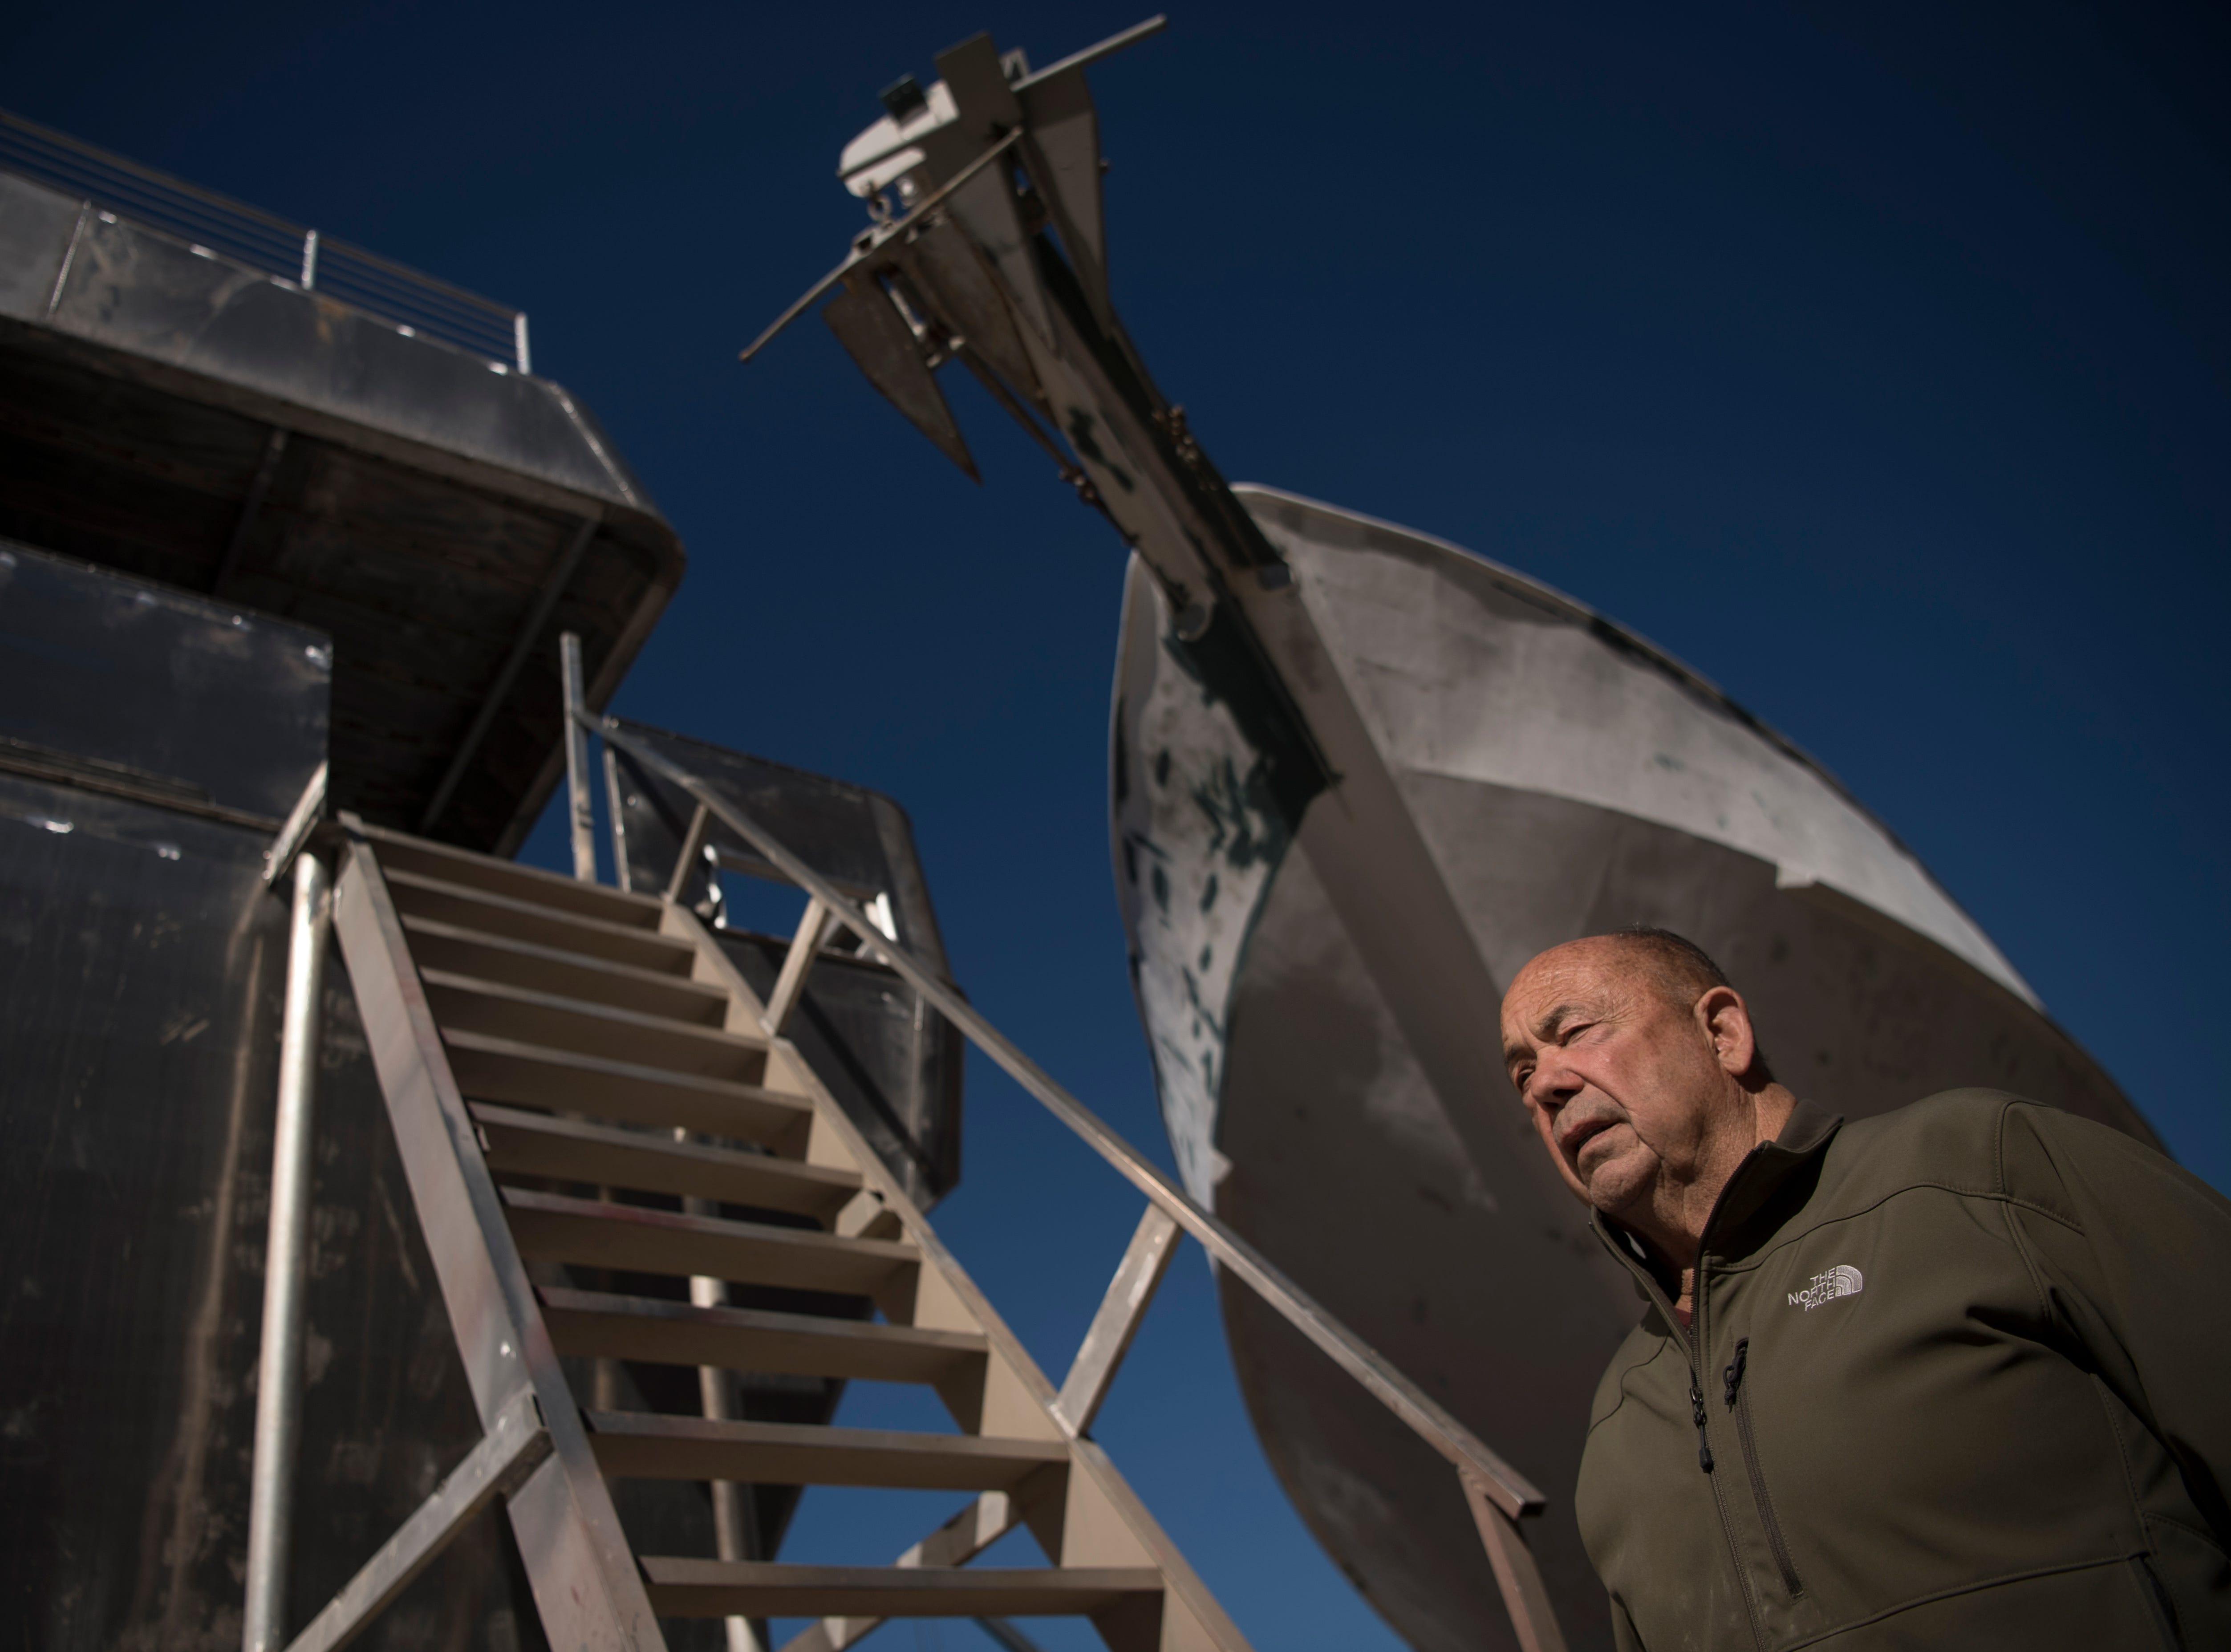 John Yank, founder of Yank Marine, at his shipyard in Tuckahoe on Thursday, October 25, 2018.